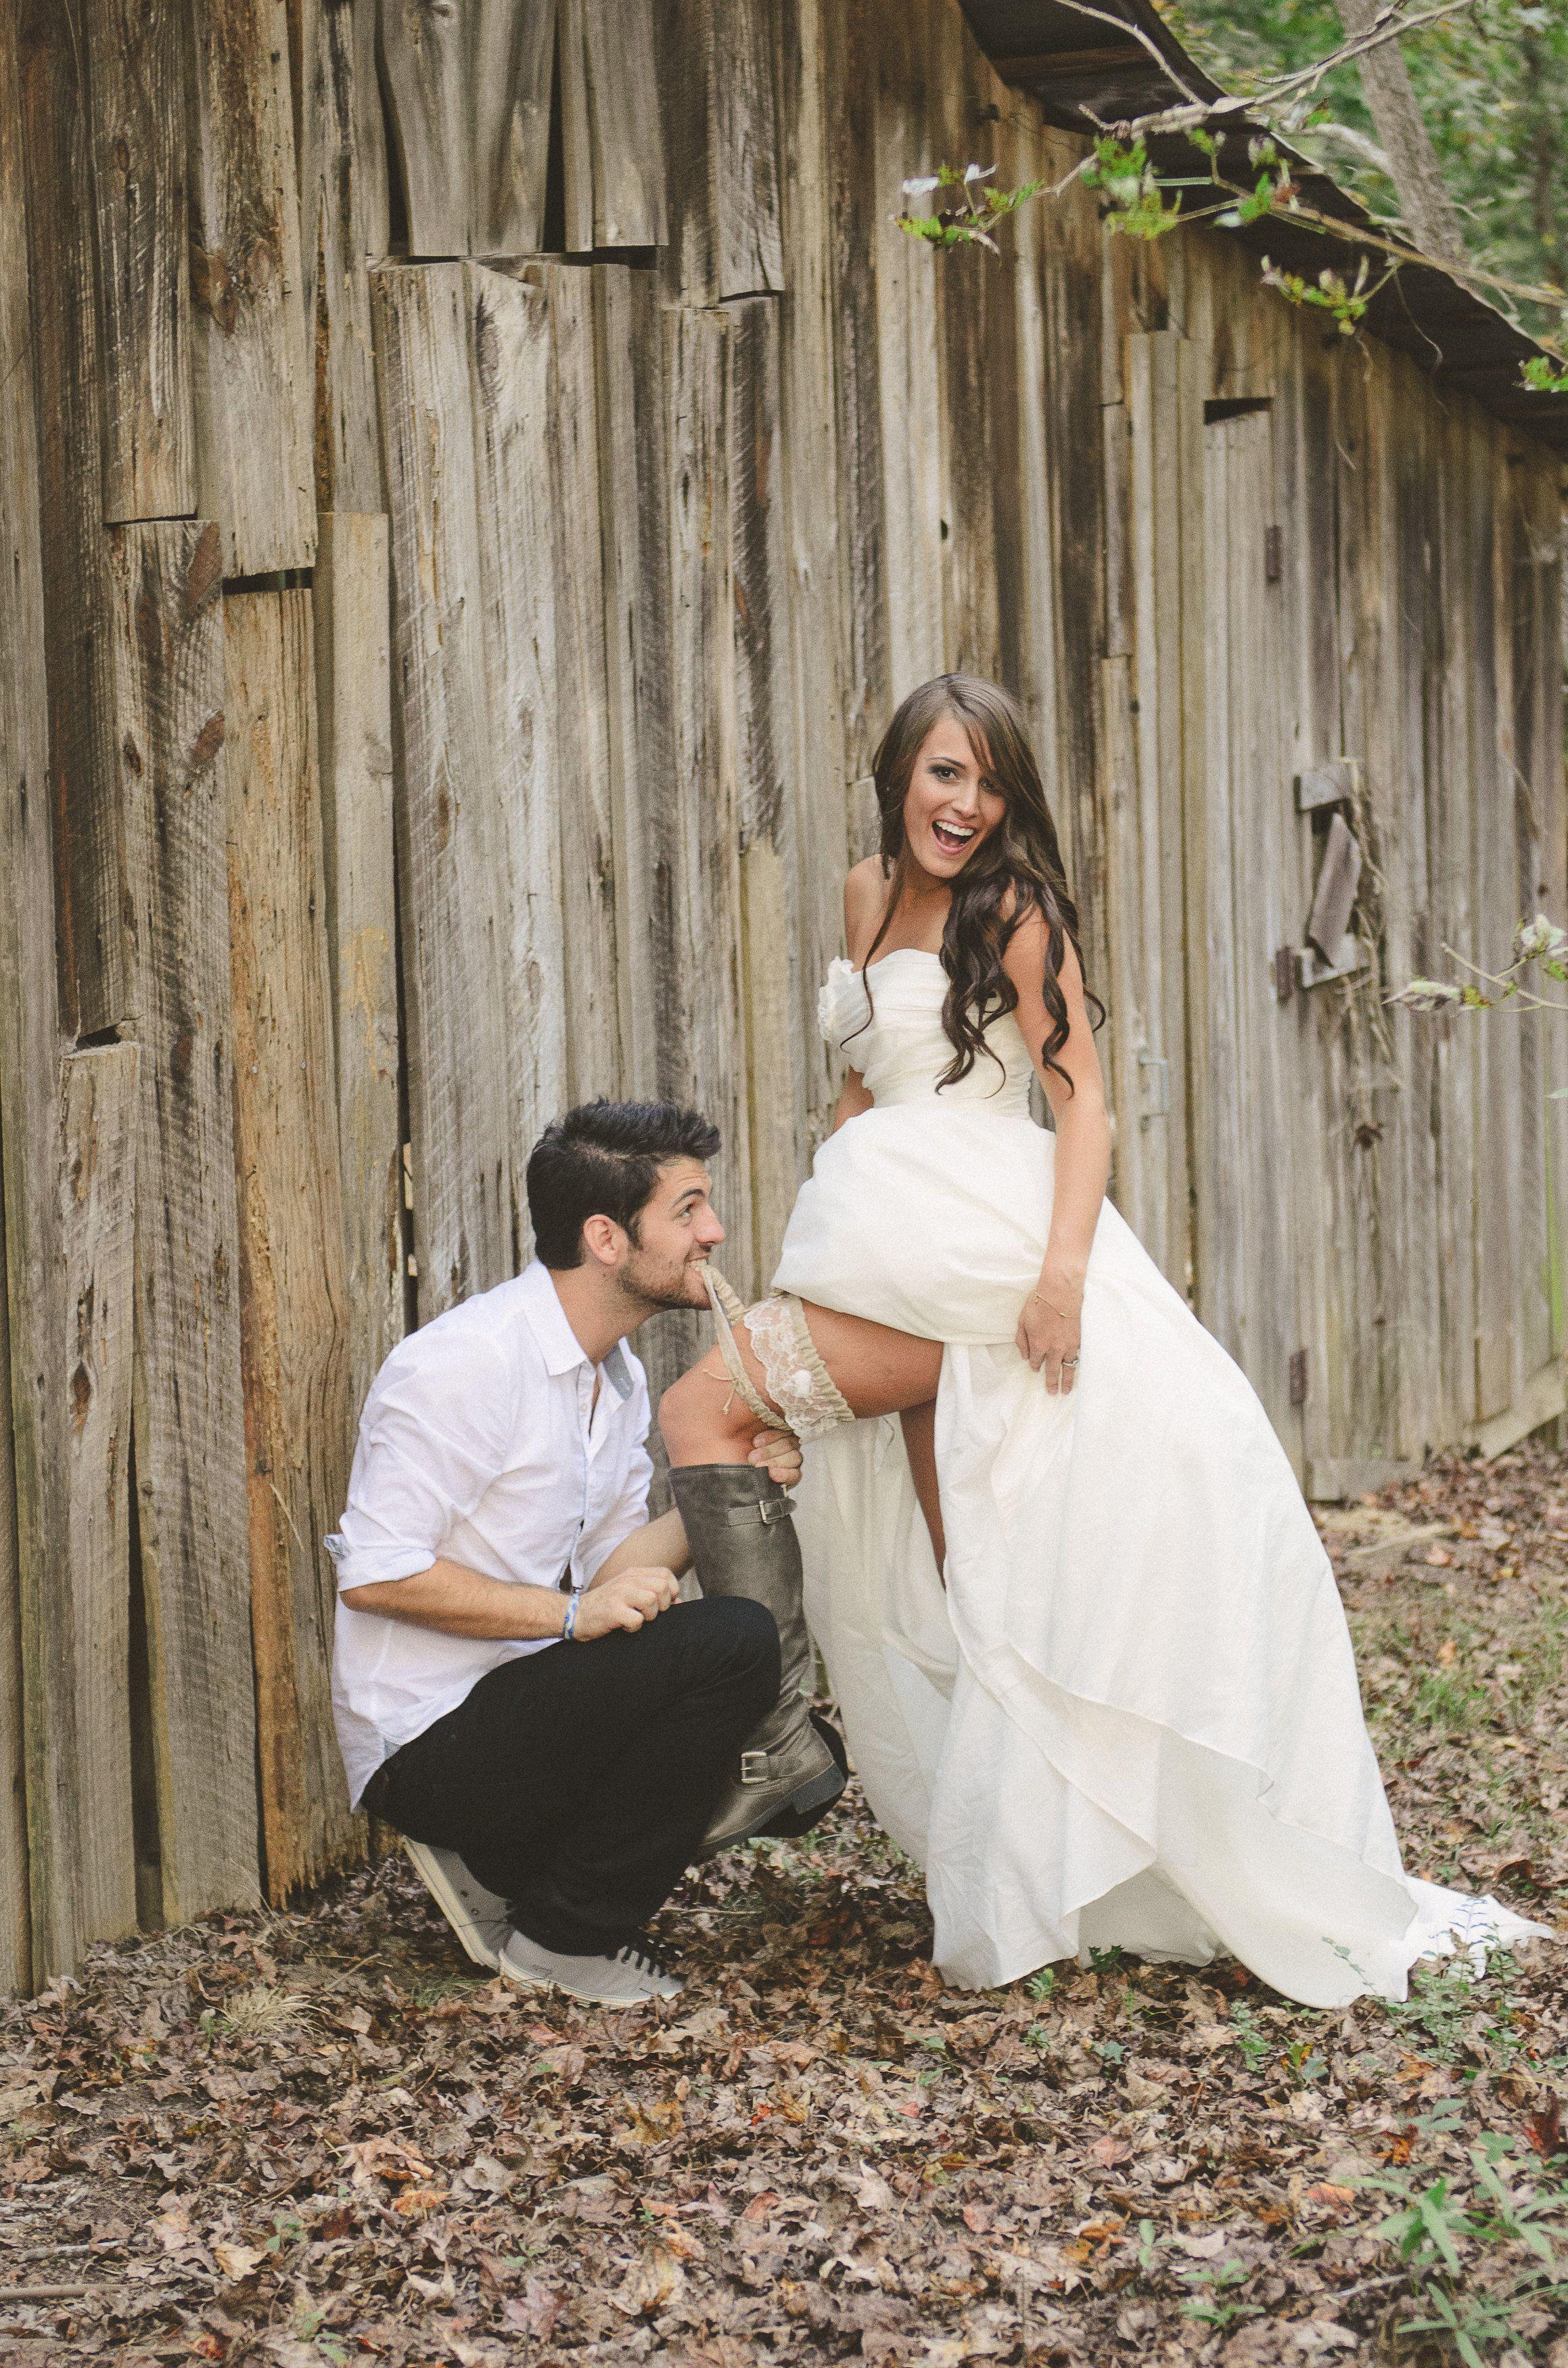 Our Barn Wedding Photography Rustic Bride And Groom Garter Pose